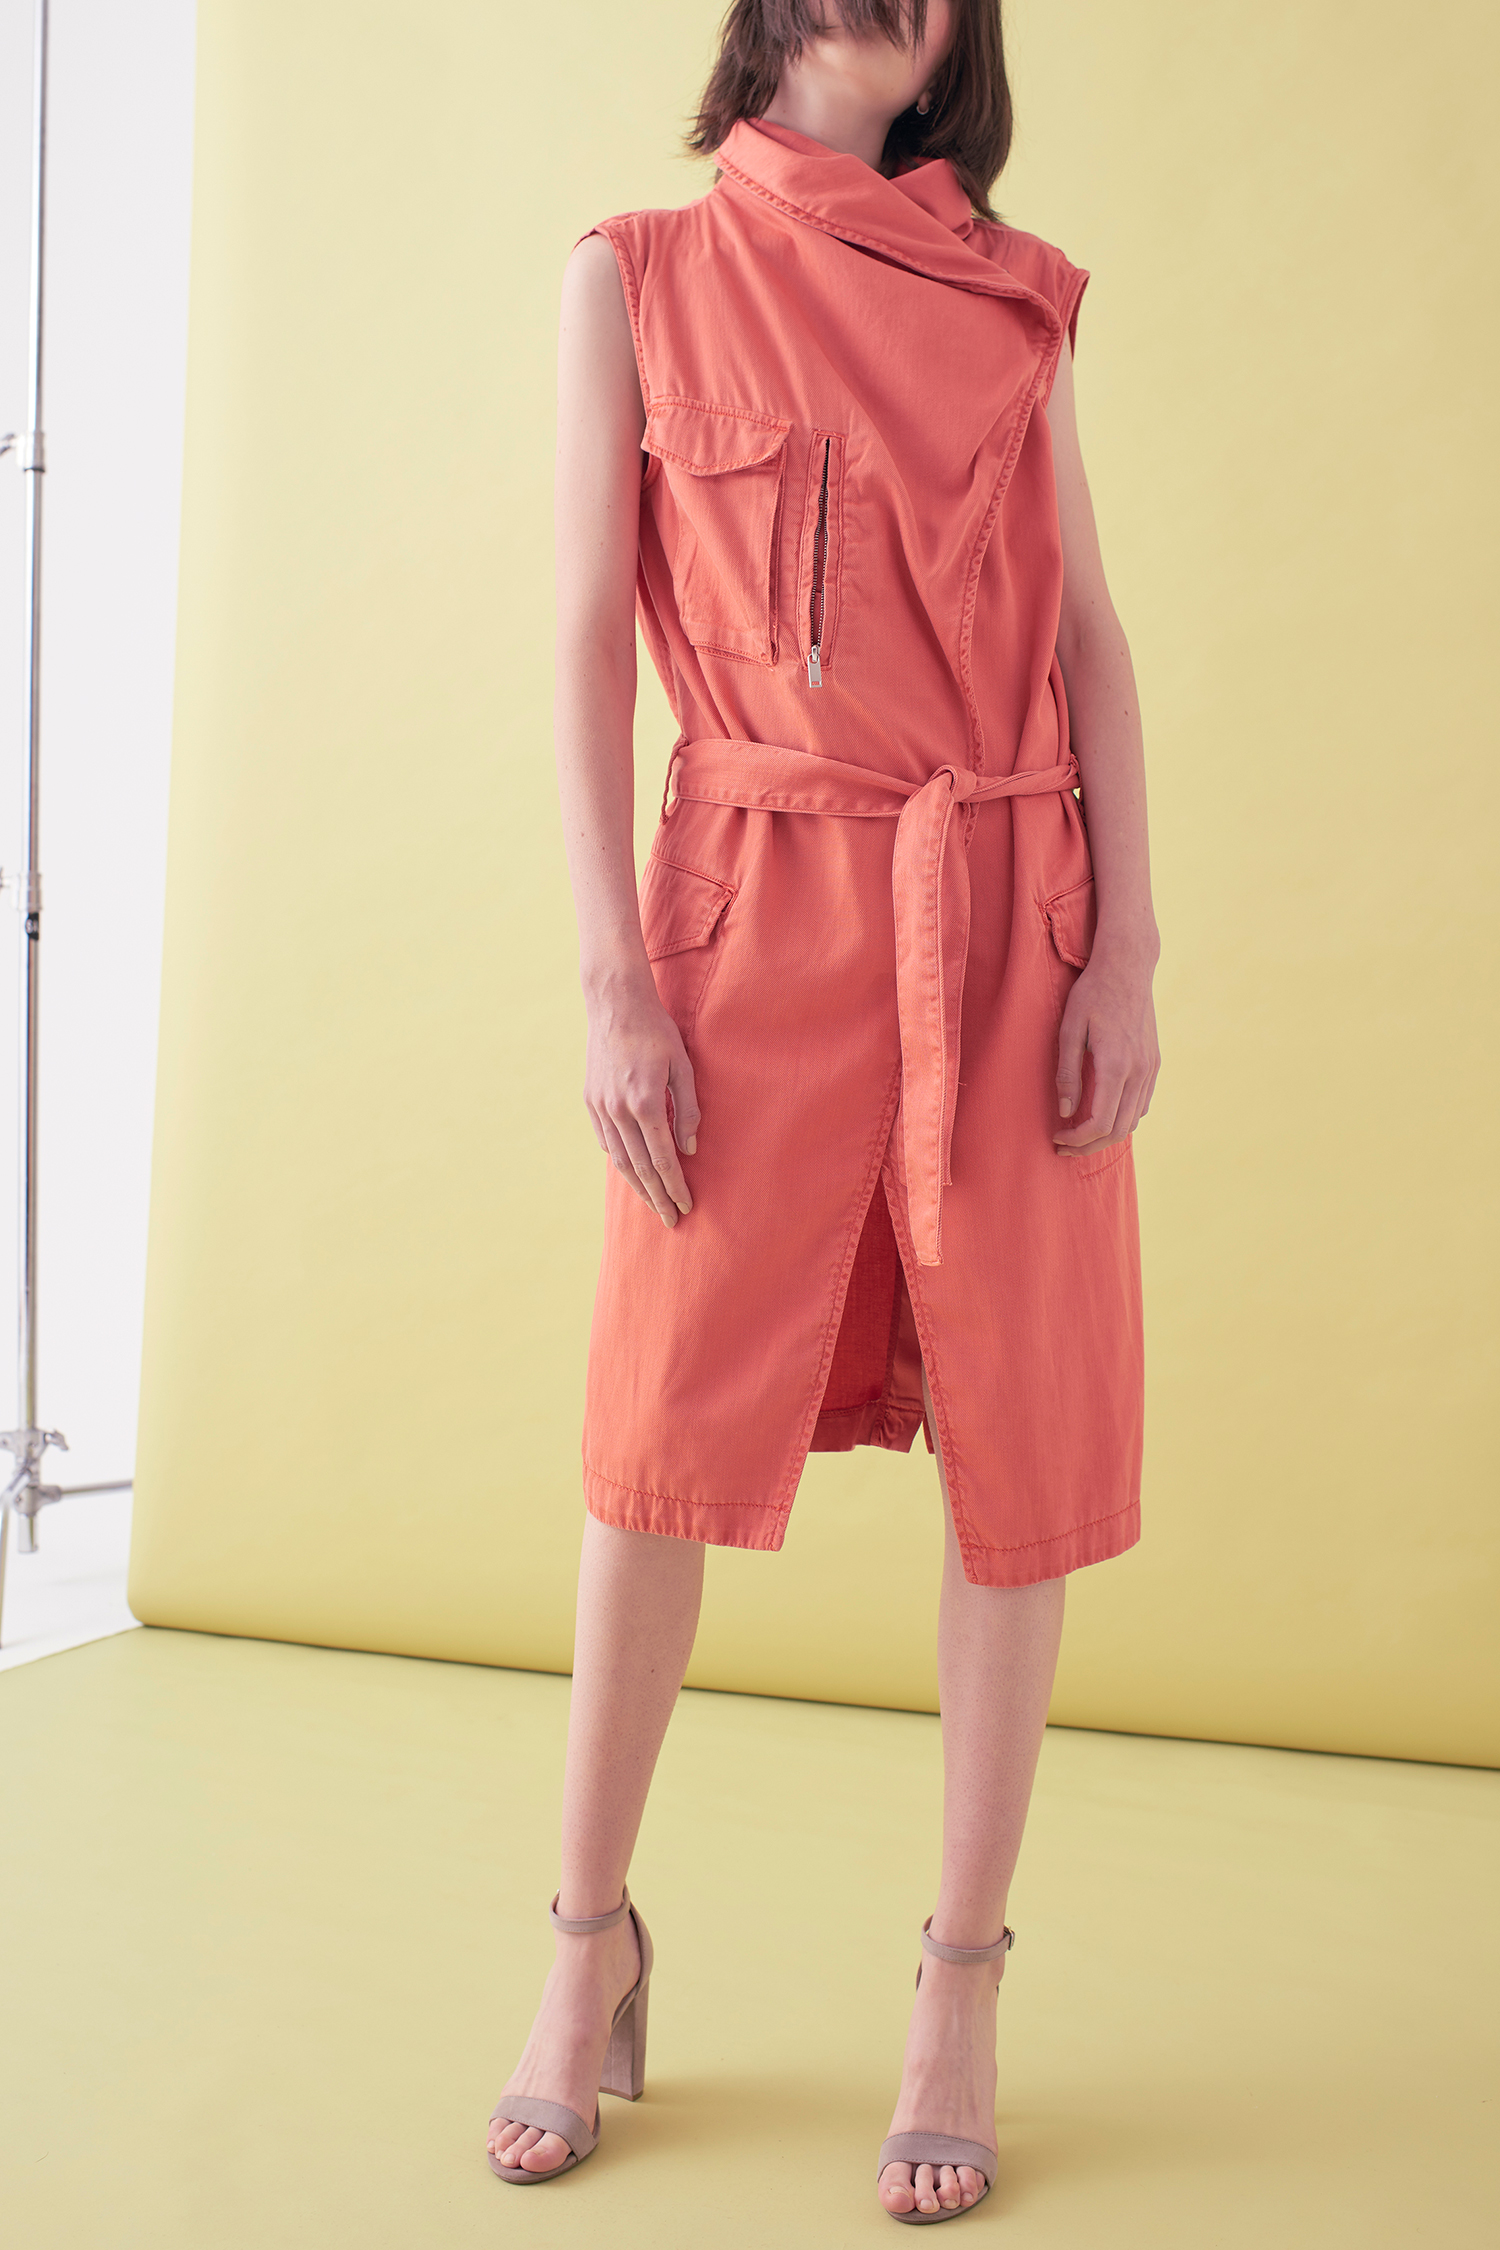 Sarah_Swann_SS17_39_Garment_Dyed_Cotton_Sleeveless_Long_Jacket_Coral_F.jpg